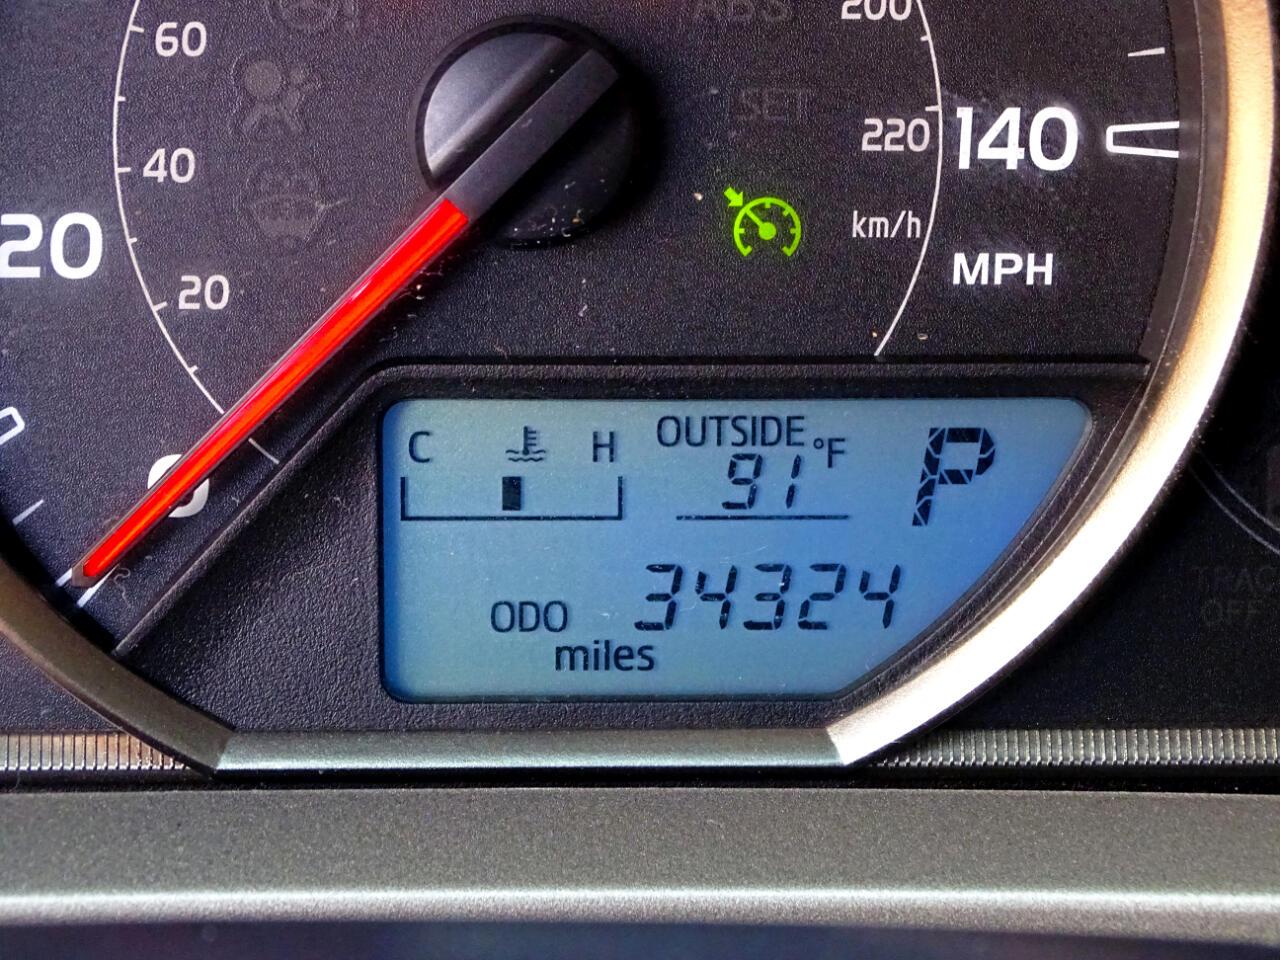 2014 Toyota RAV4 FWD 4dr XLE (Natl)